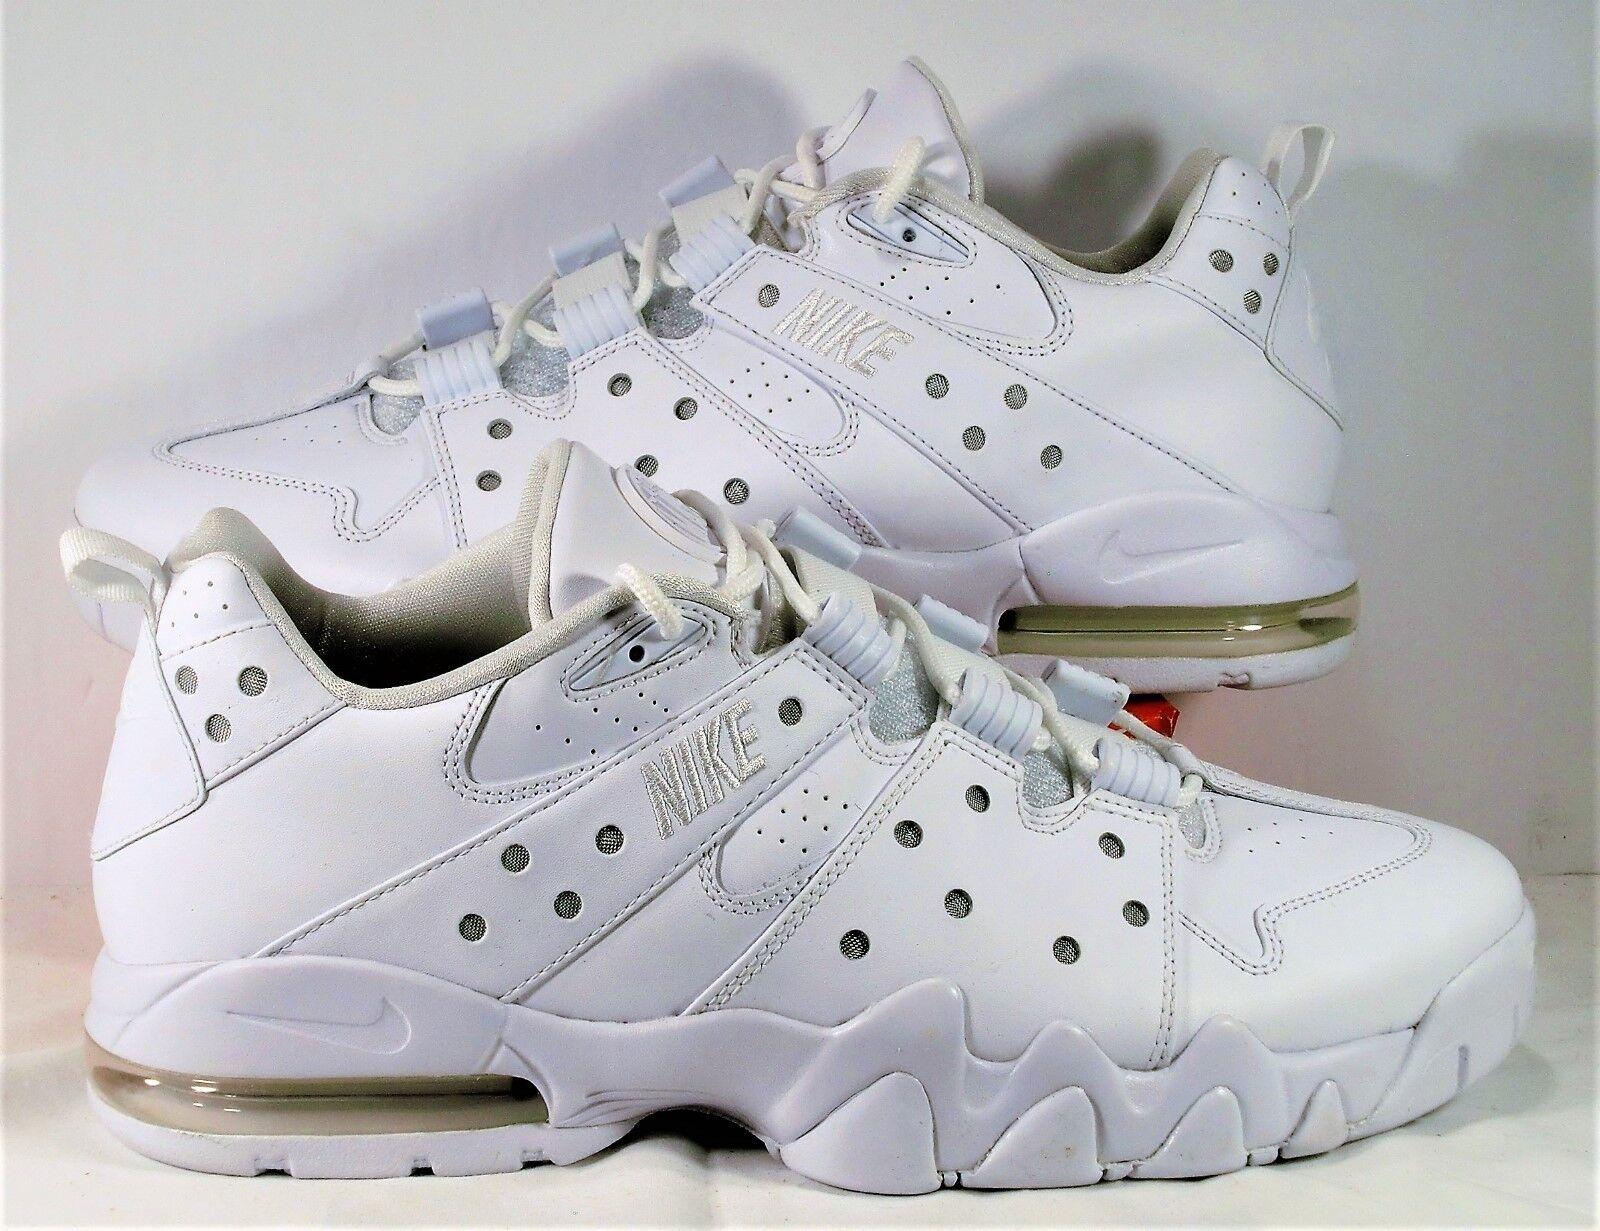 Nike Air Max 2 94 Low CB Charles Bakley Triple White Sz 13 NEW 917752 100